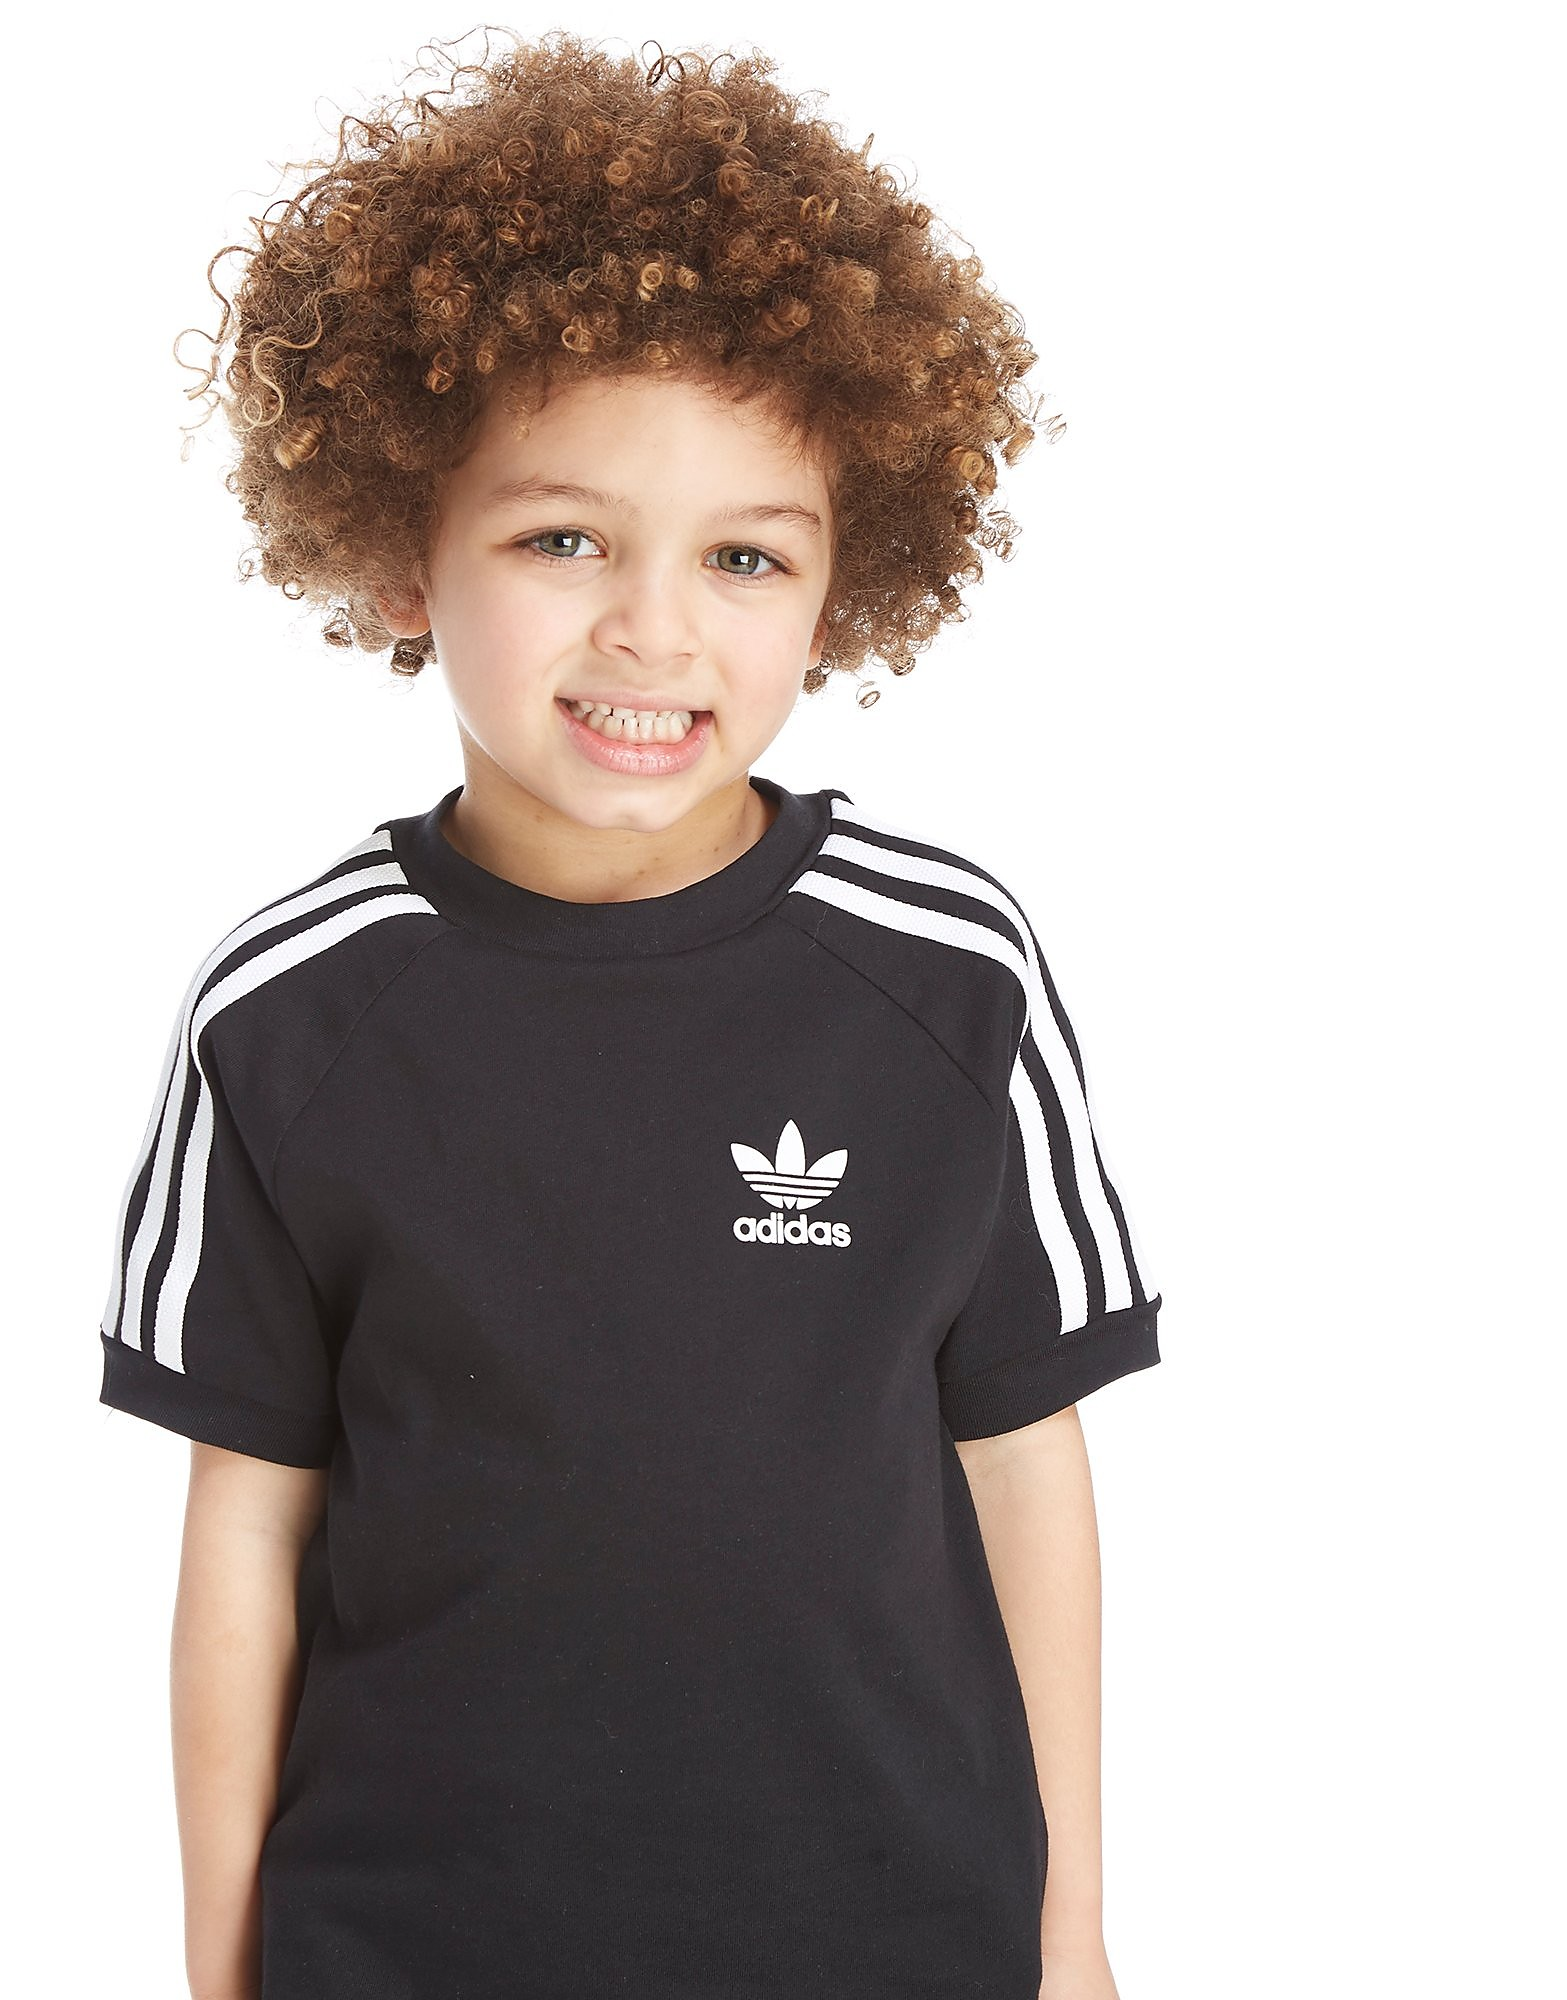 adidas Originals Girls' California T-Shirt Kinderen - Zwart - Kind